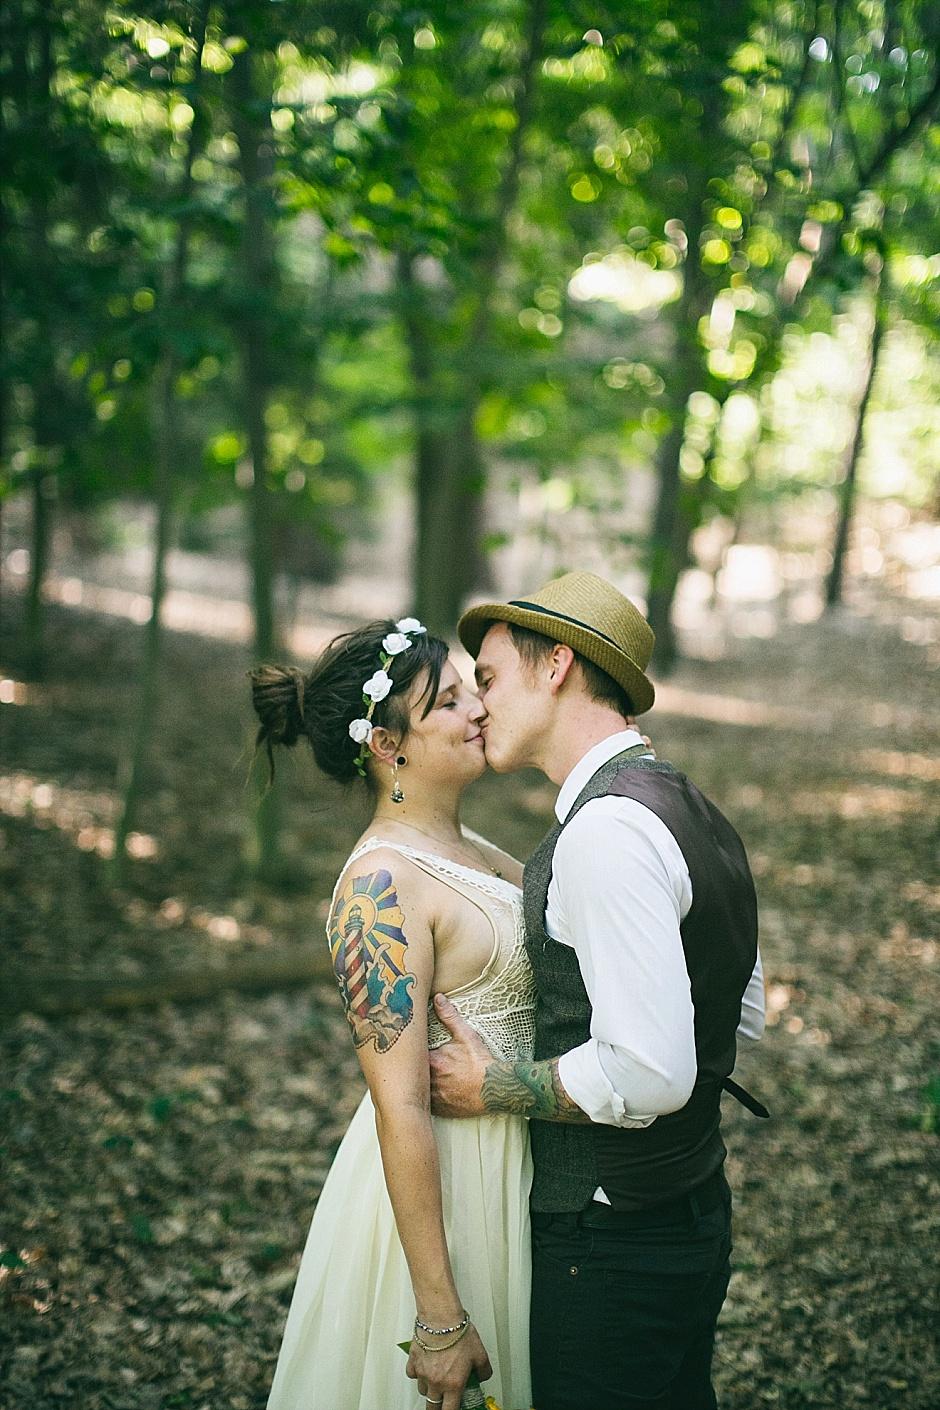 barefootwedding_hudsonvillemi_weddingphotographer099